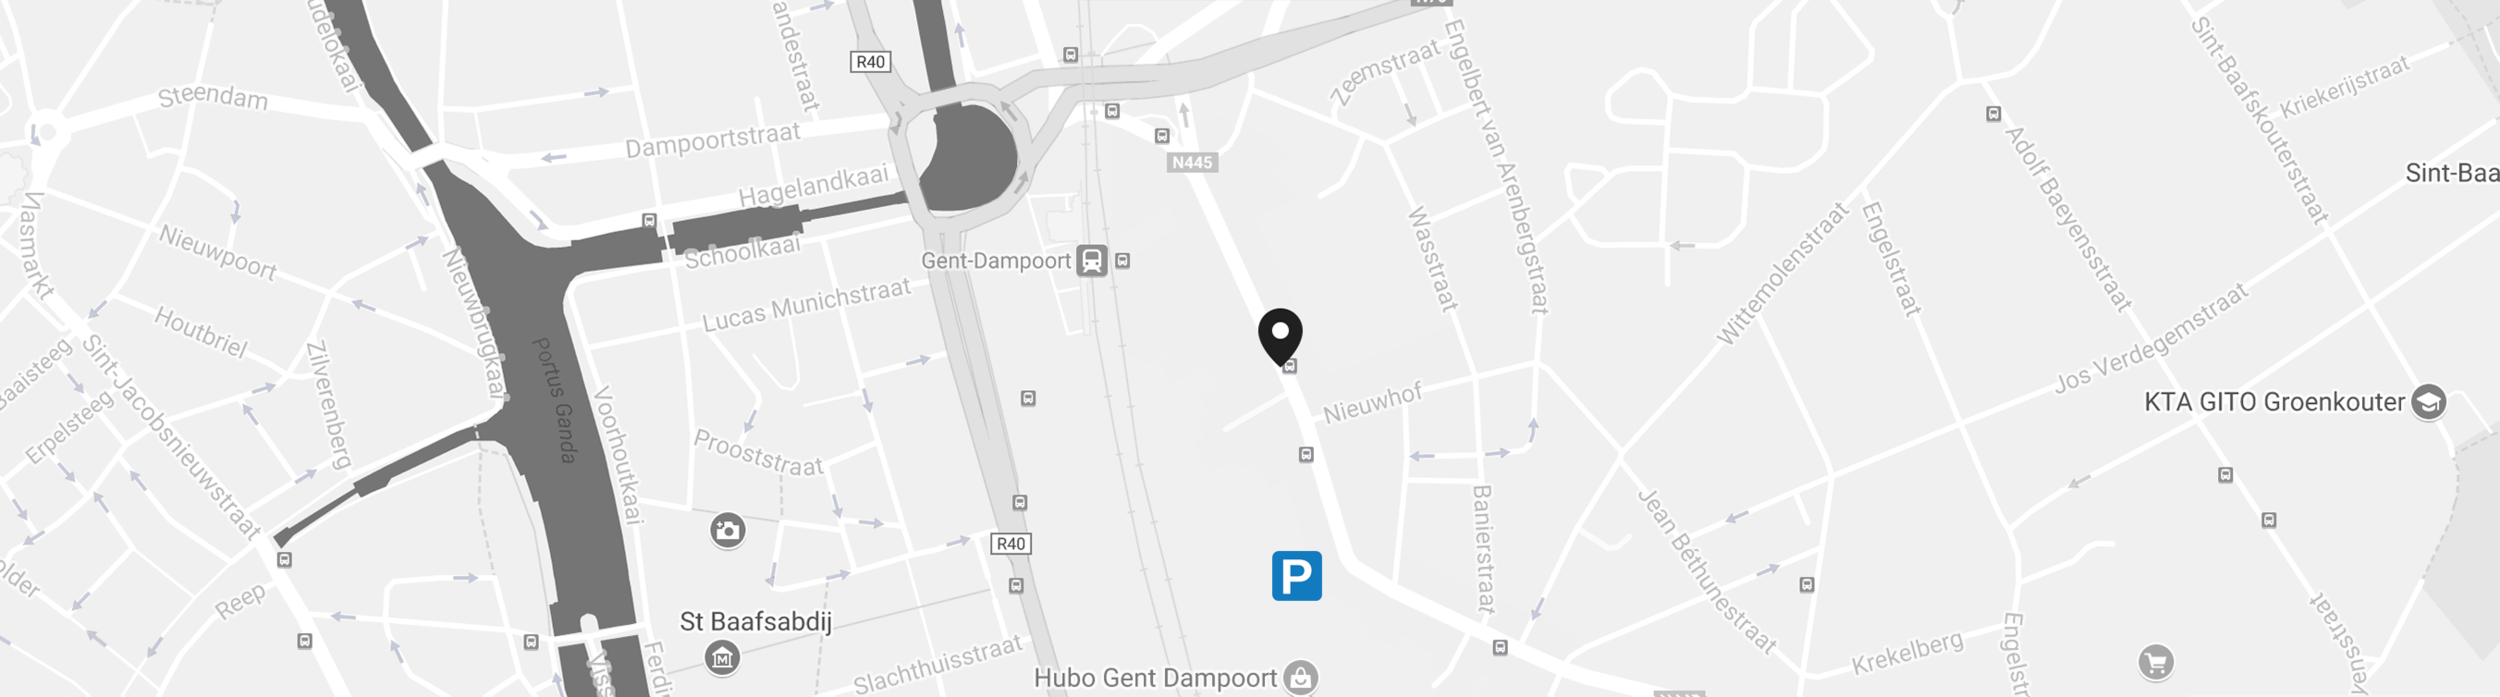 parking alberte.png